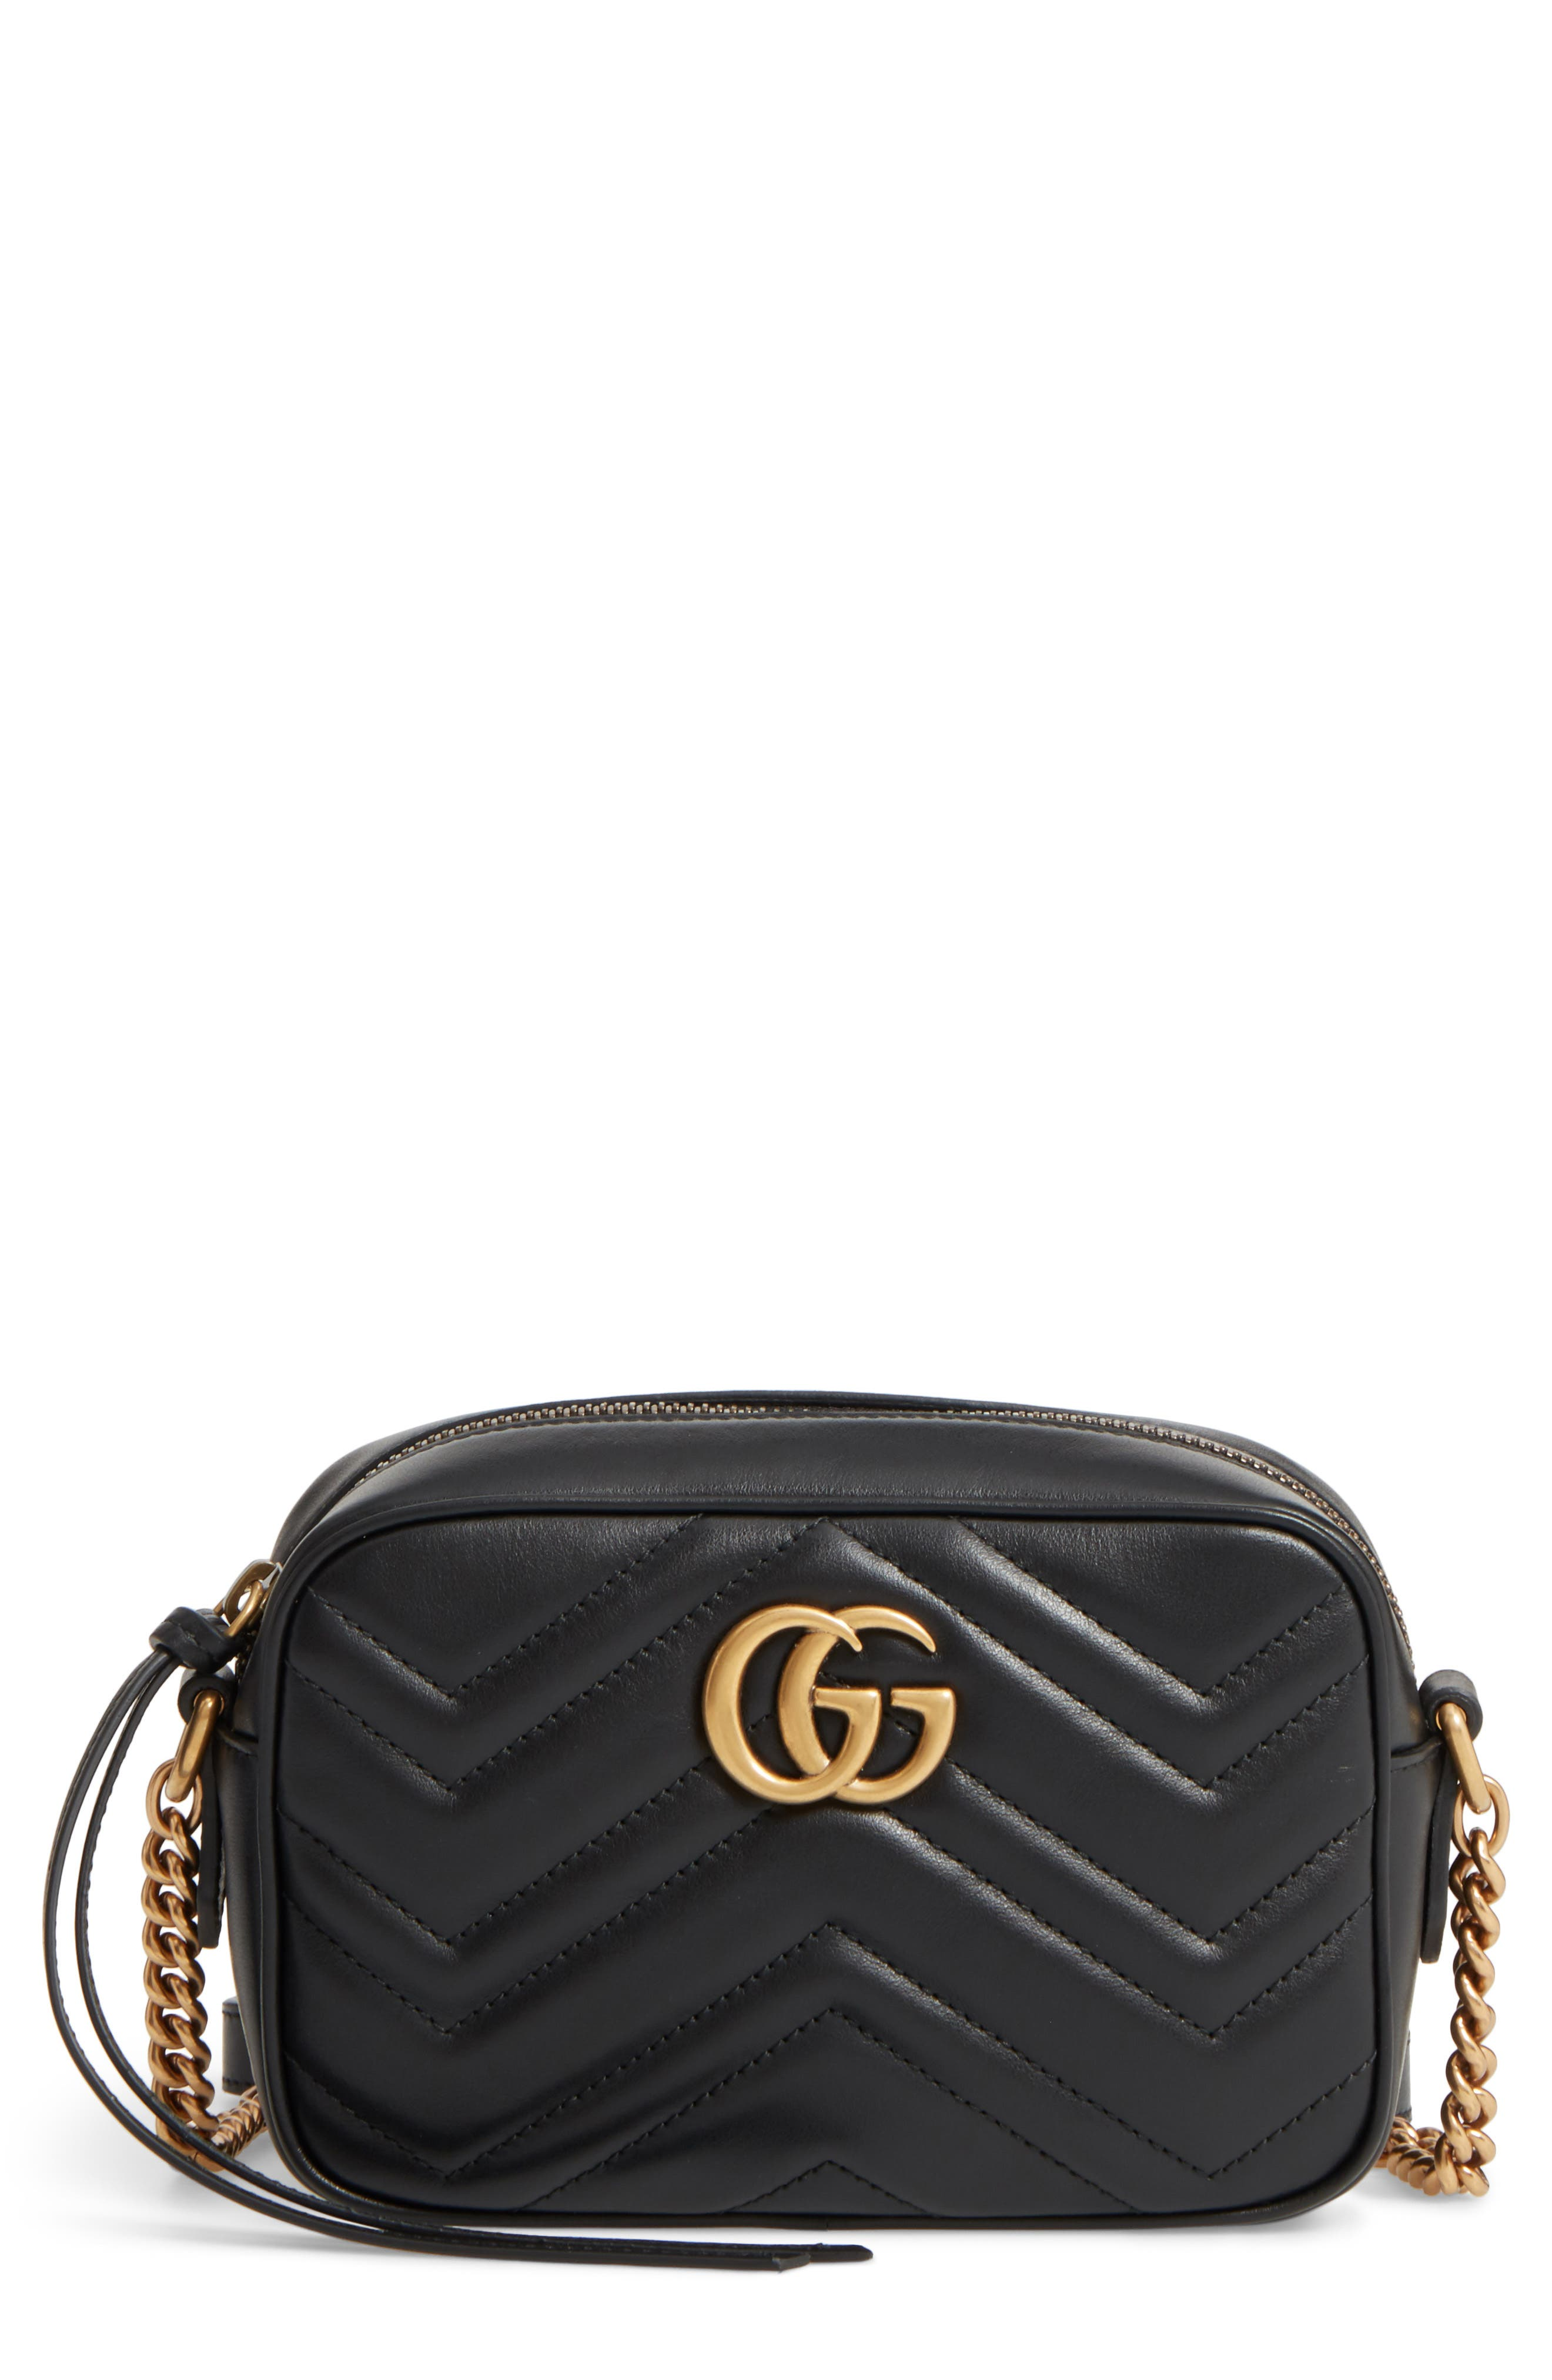 Alternate Image 1 Selected - Gucci GG Marmont 2.0 Matelassé Leather Shoulder Bag